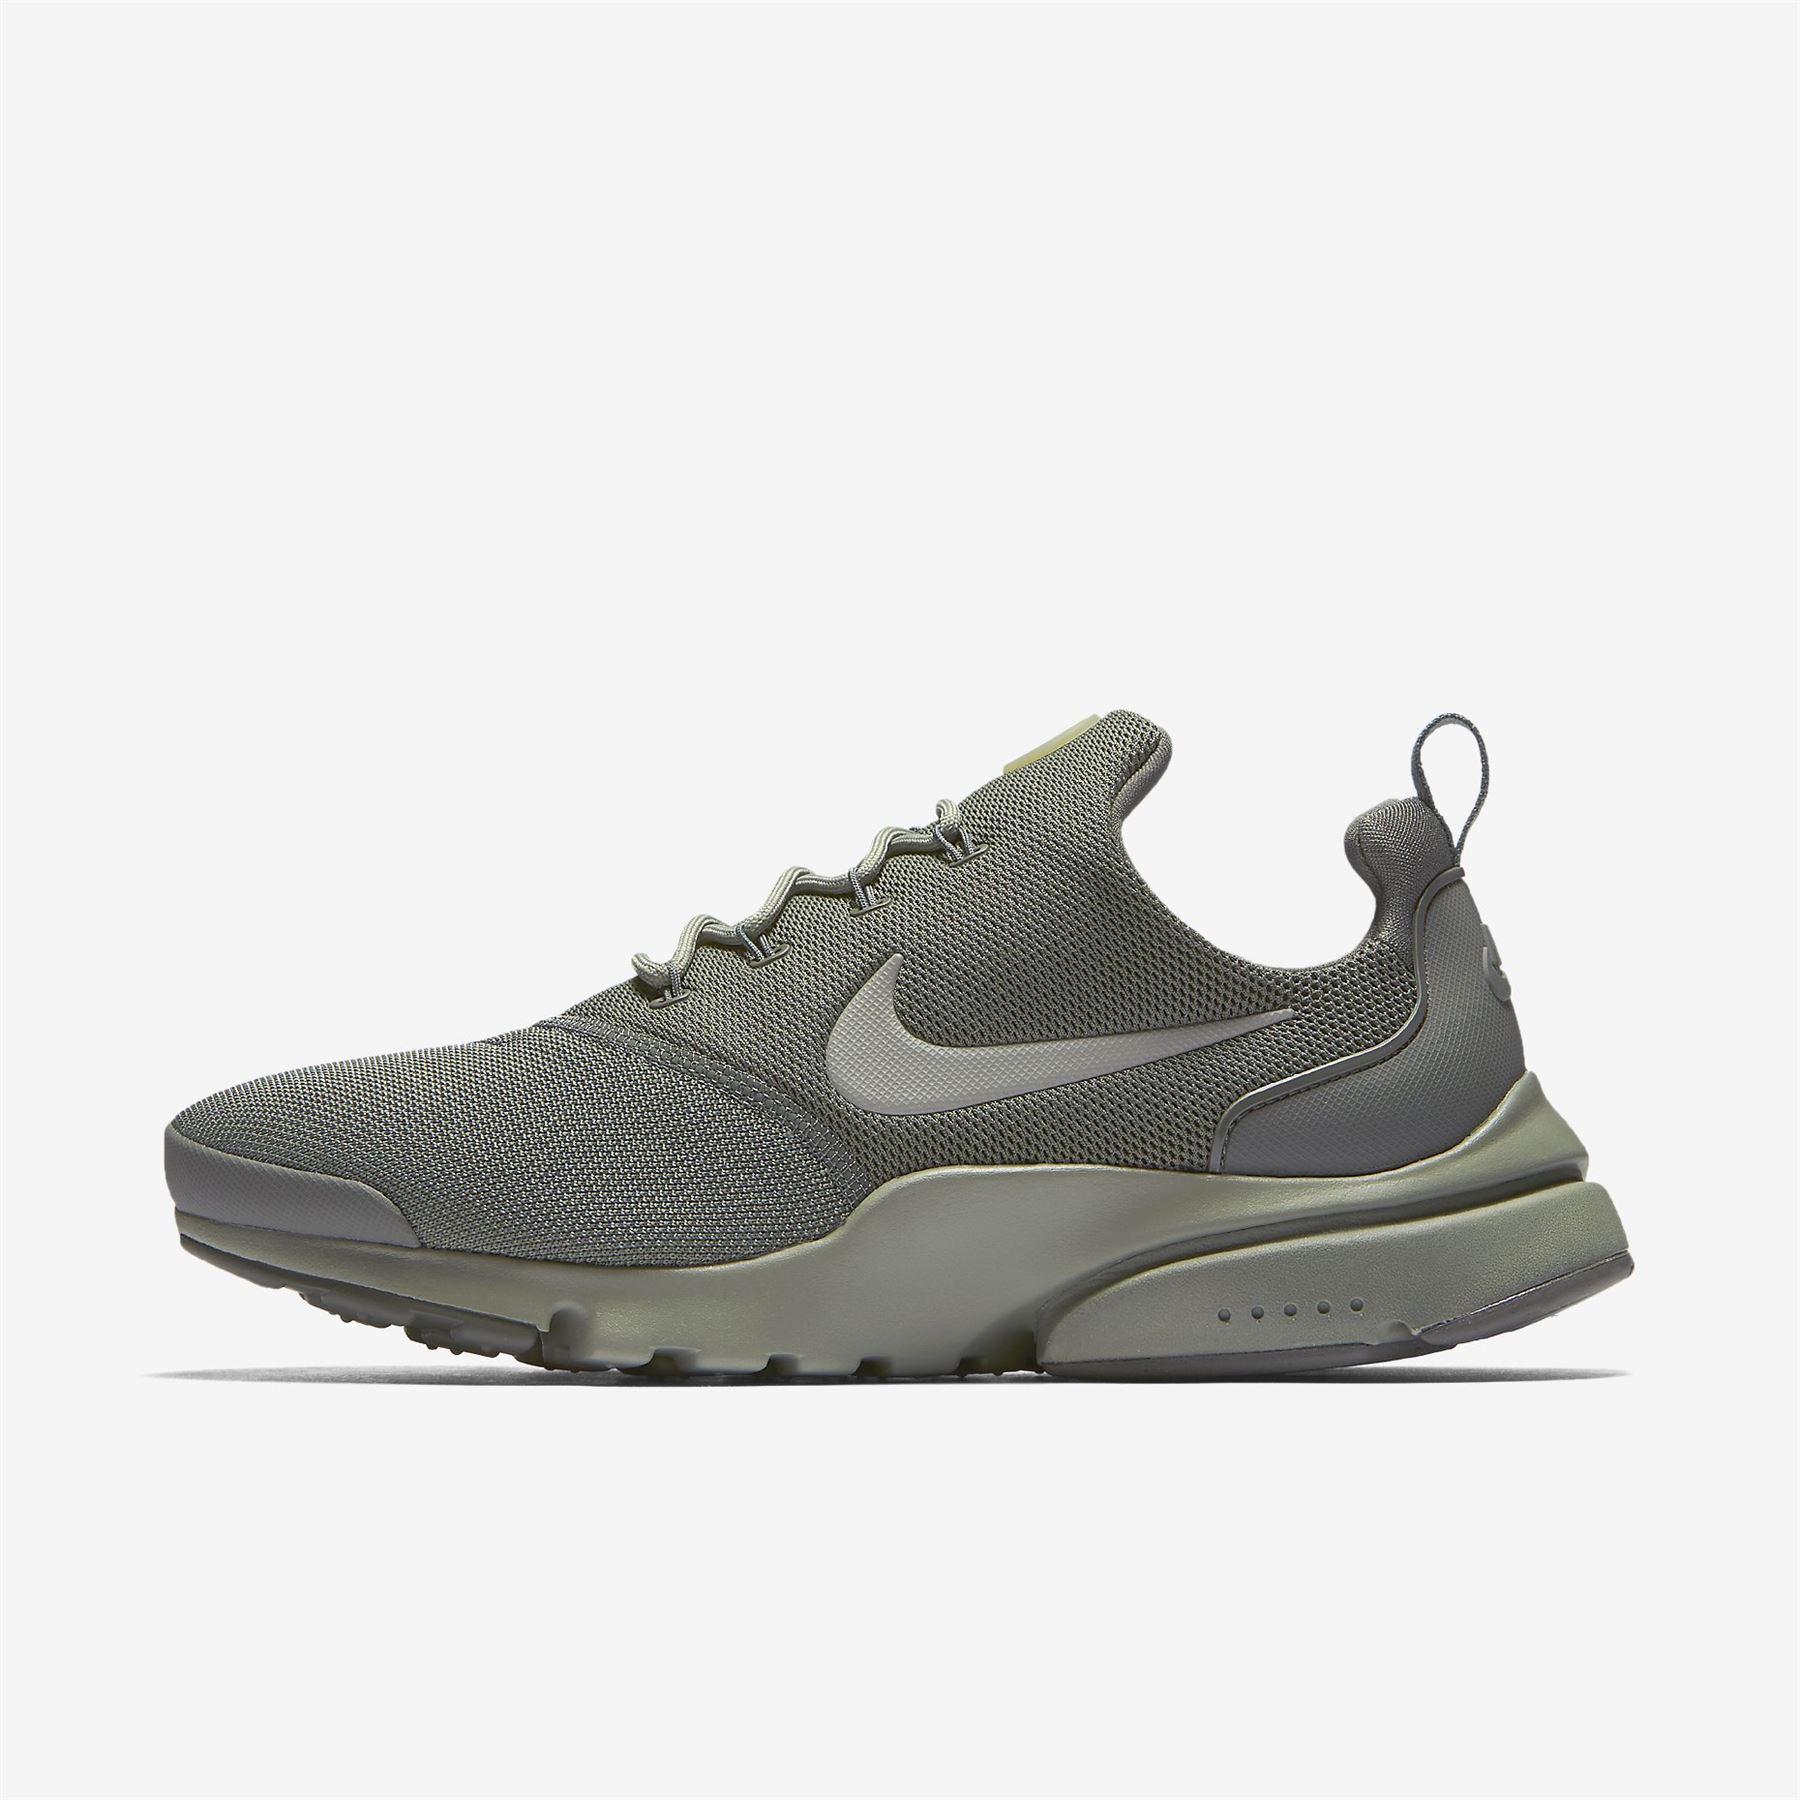 NIKE AIR PRESTO FLY Herrenschuhe Sneaker Turnschuhe Herren Schuhe 908019 201